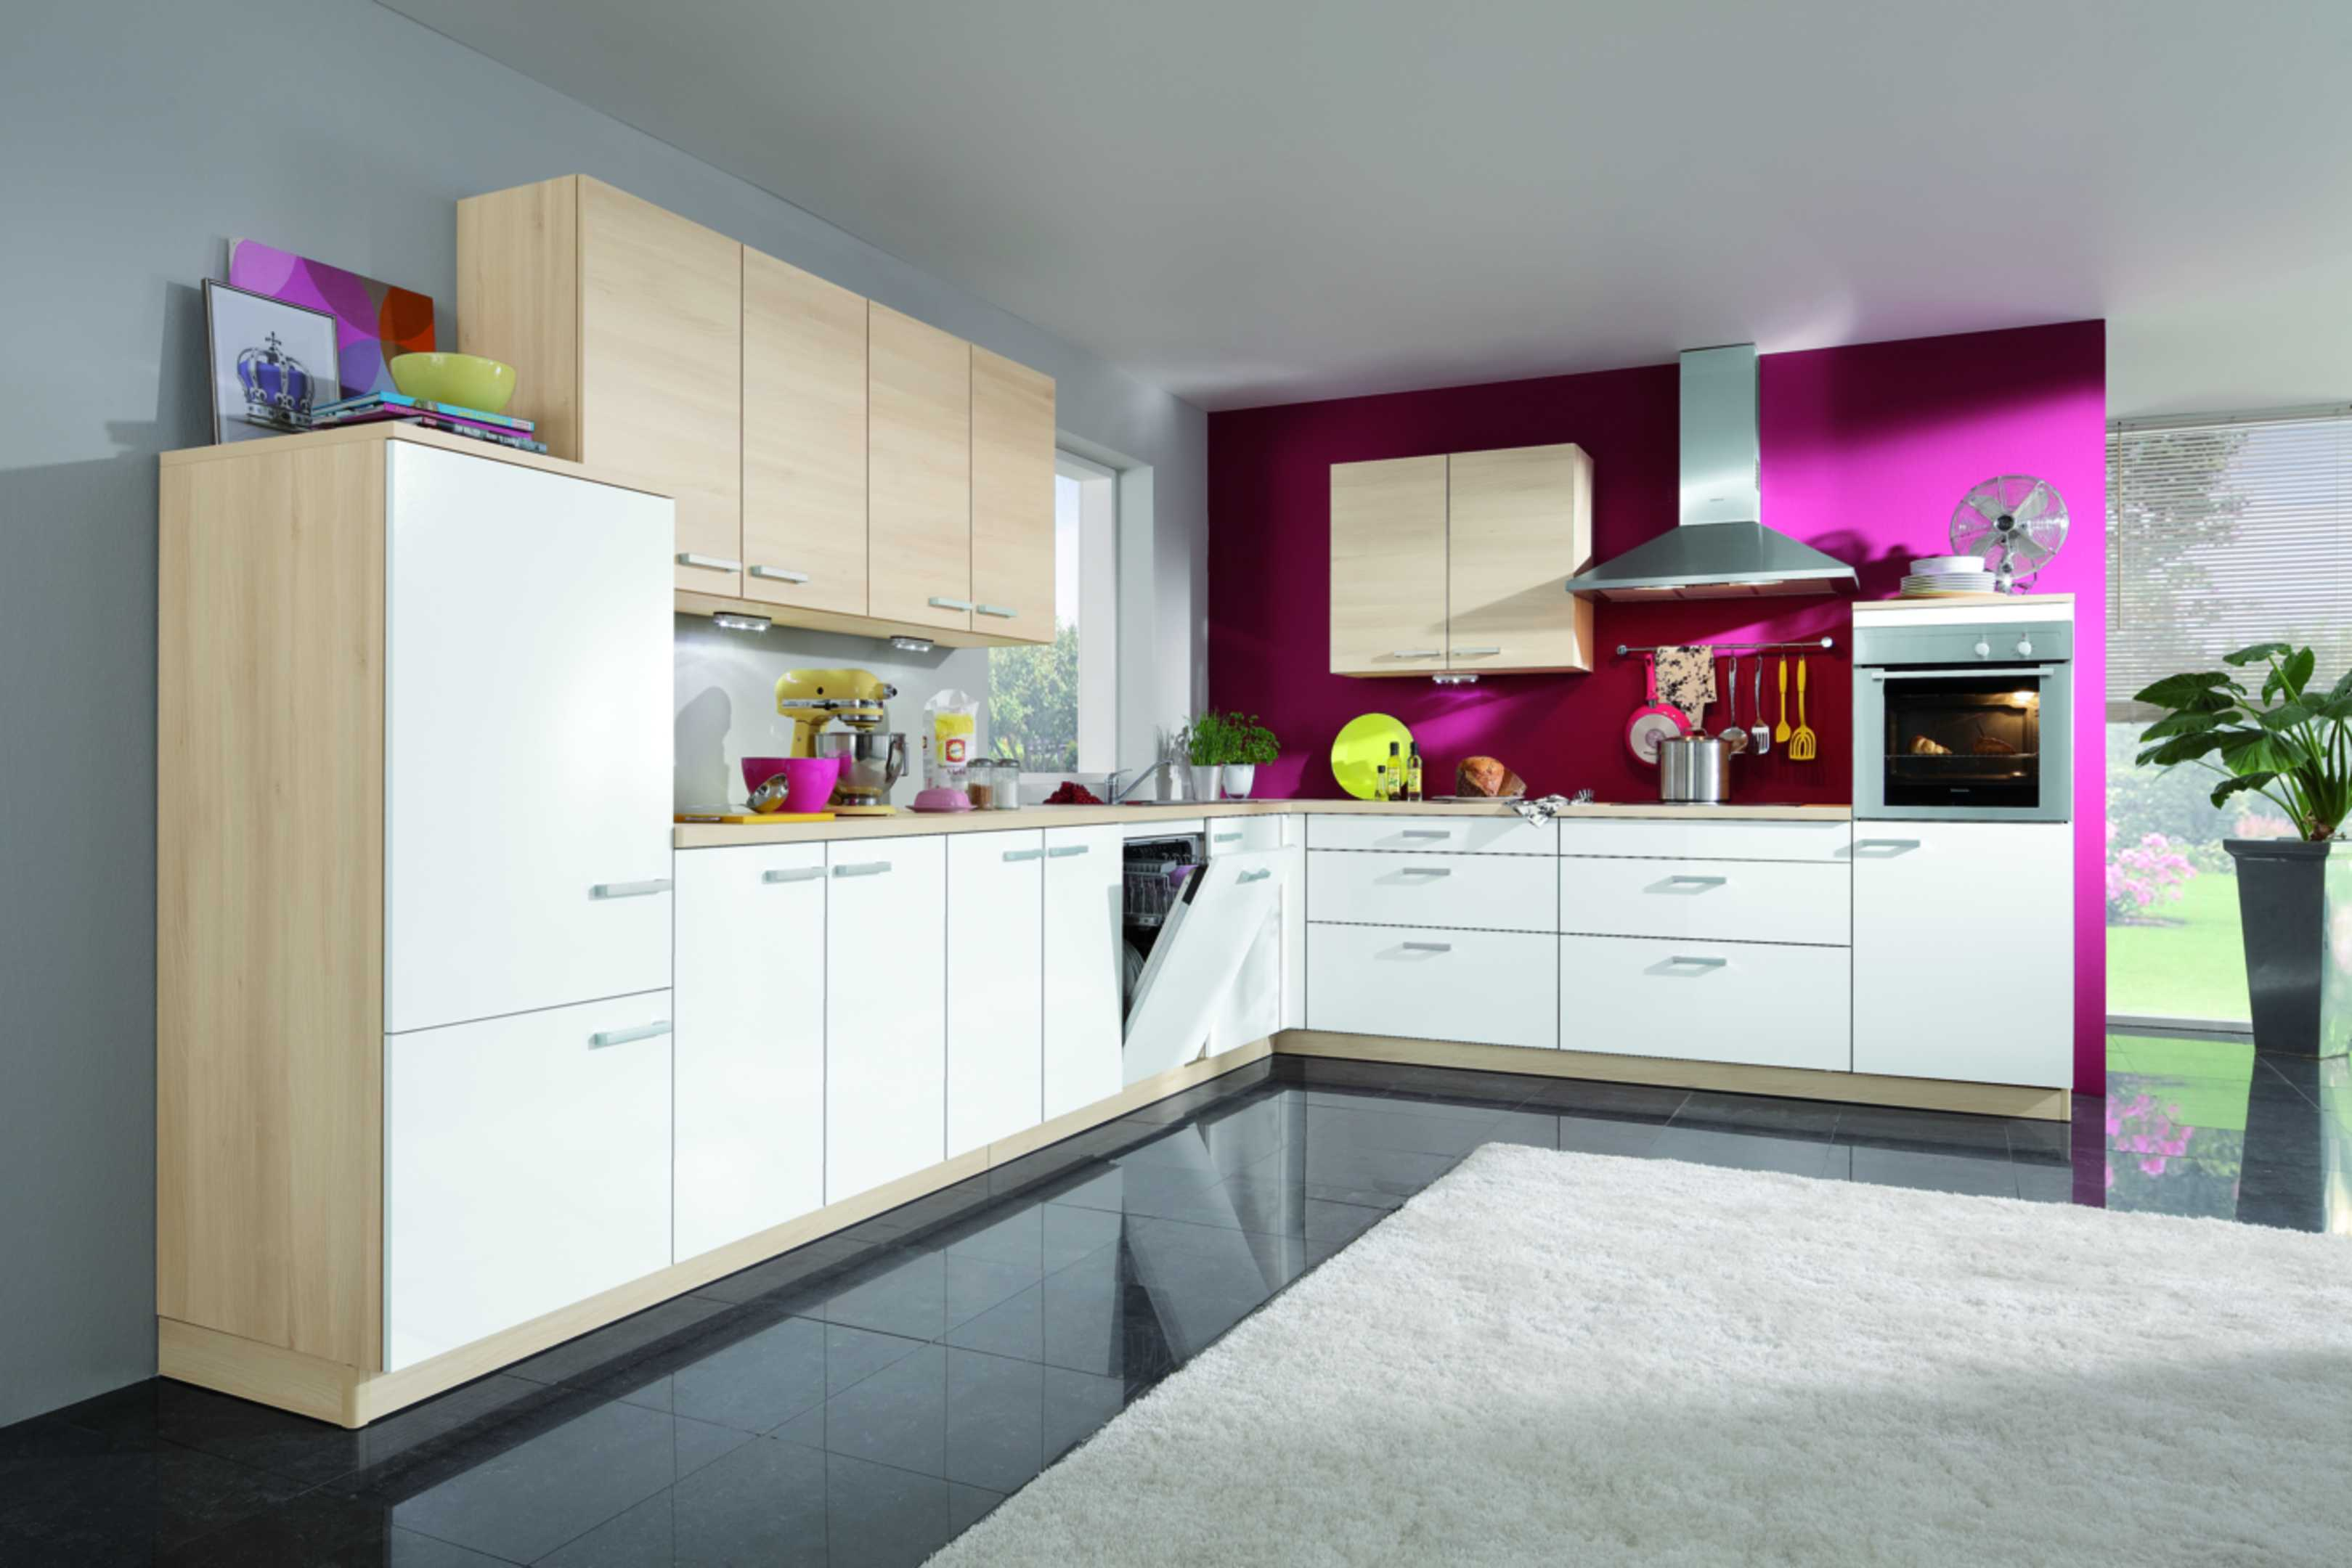 modern interior design of kitchen with wooden set black tile and cream rug - Violet Kitchen 2015